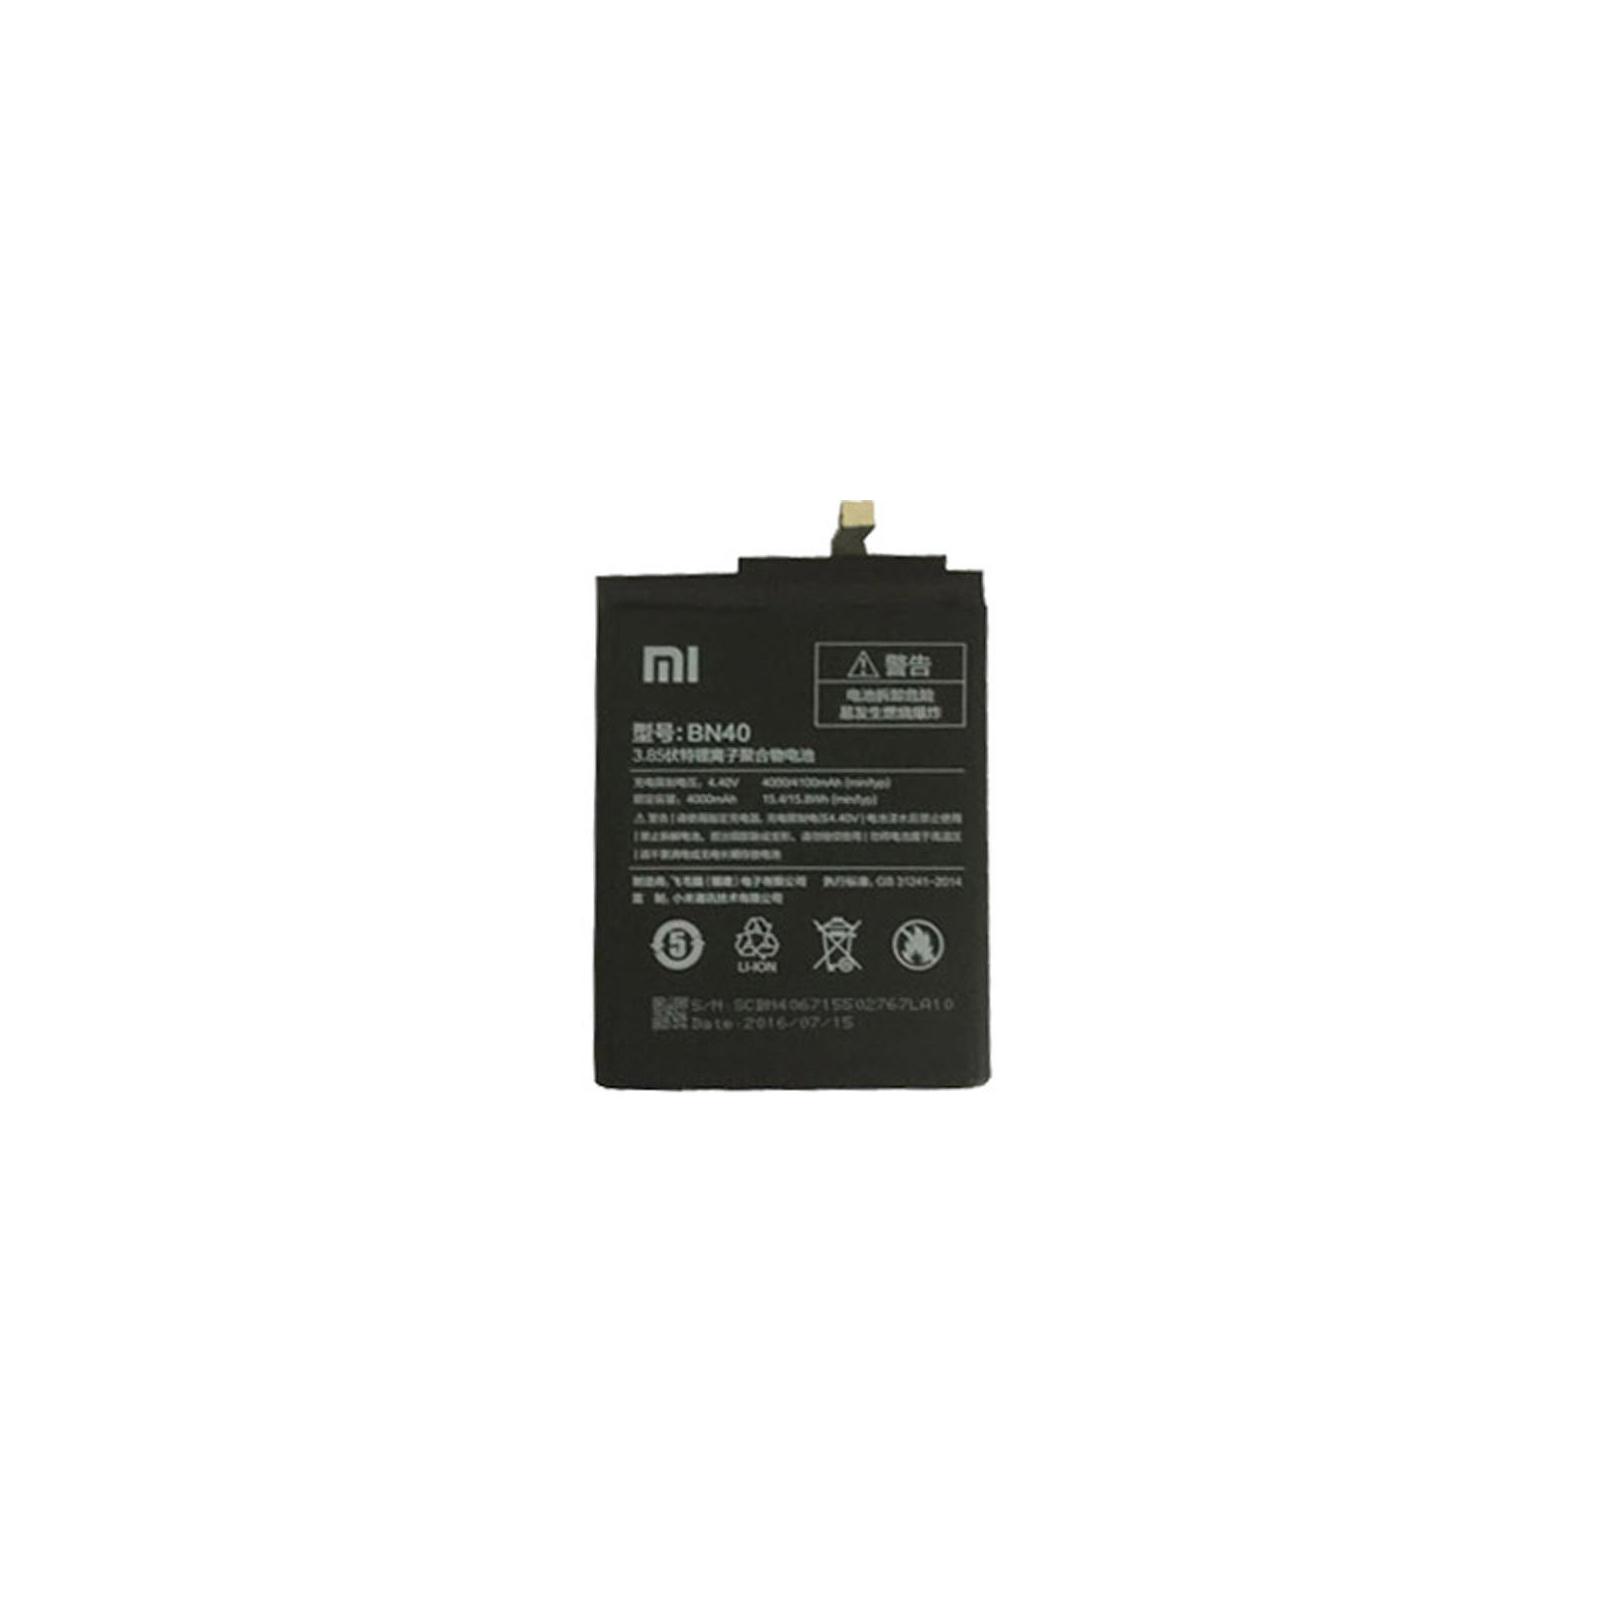 Аккумуляторная батарея Xiaomi for Redmi 4 Pro (BN40 / 57487)